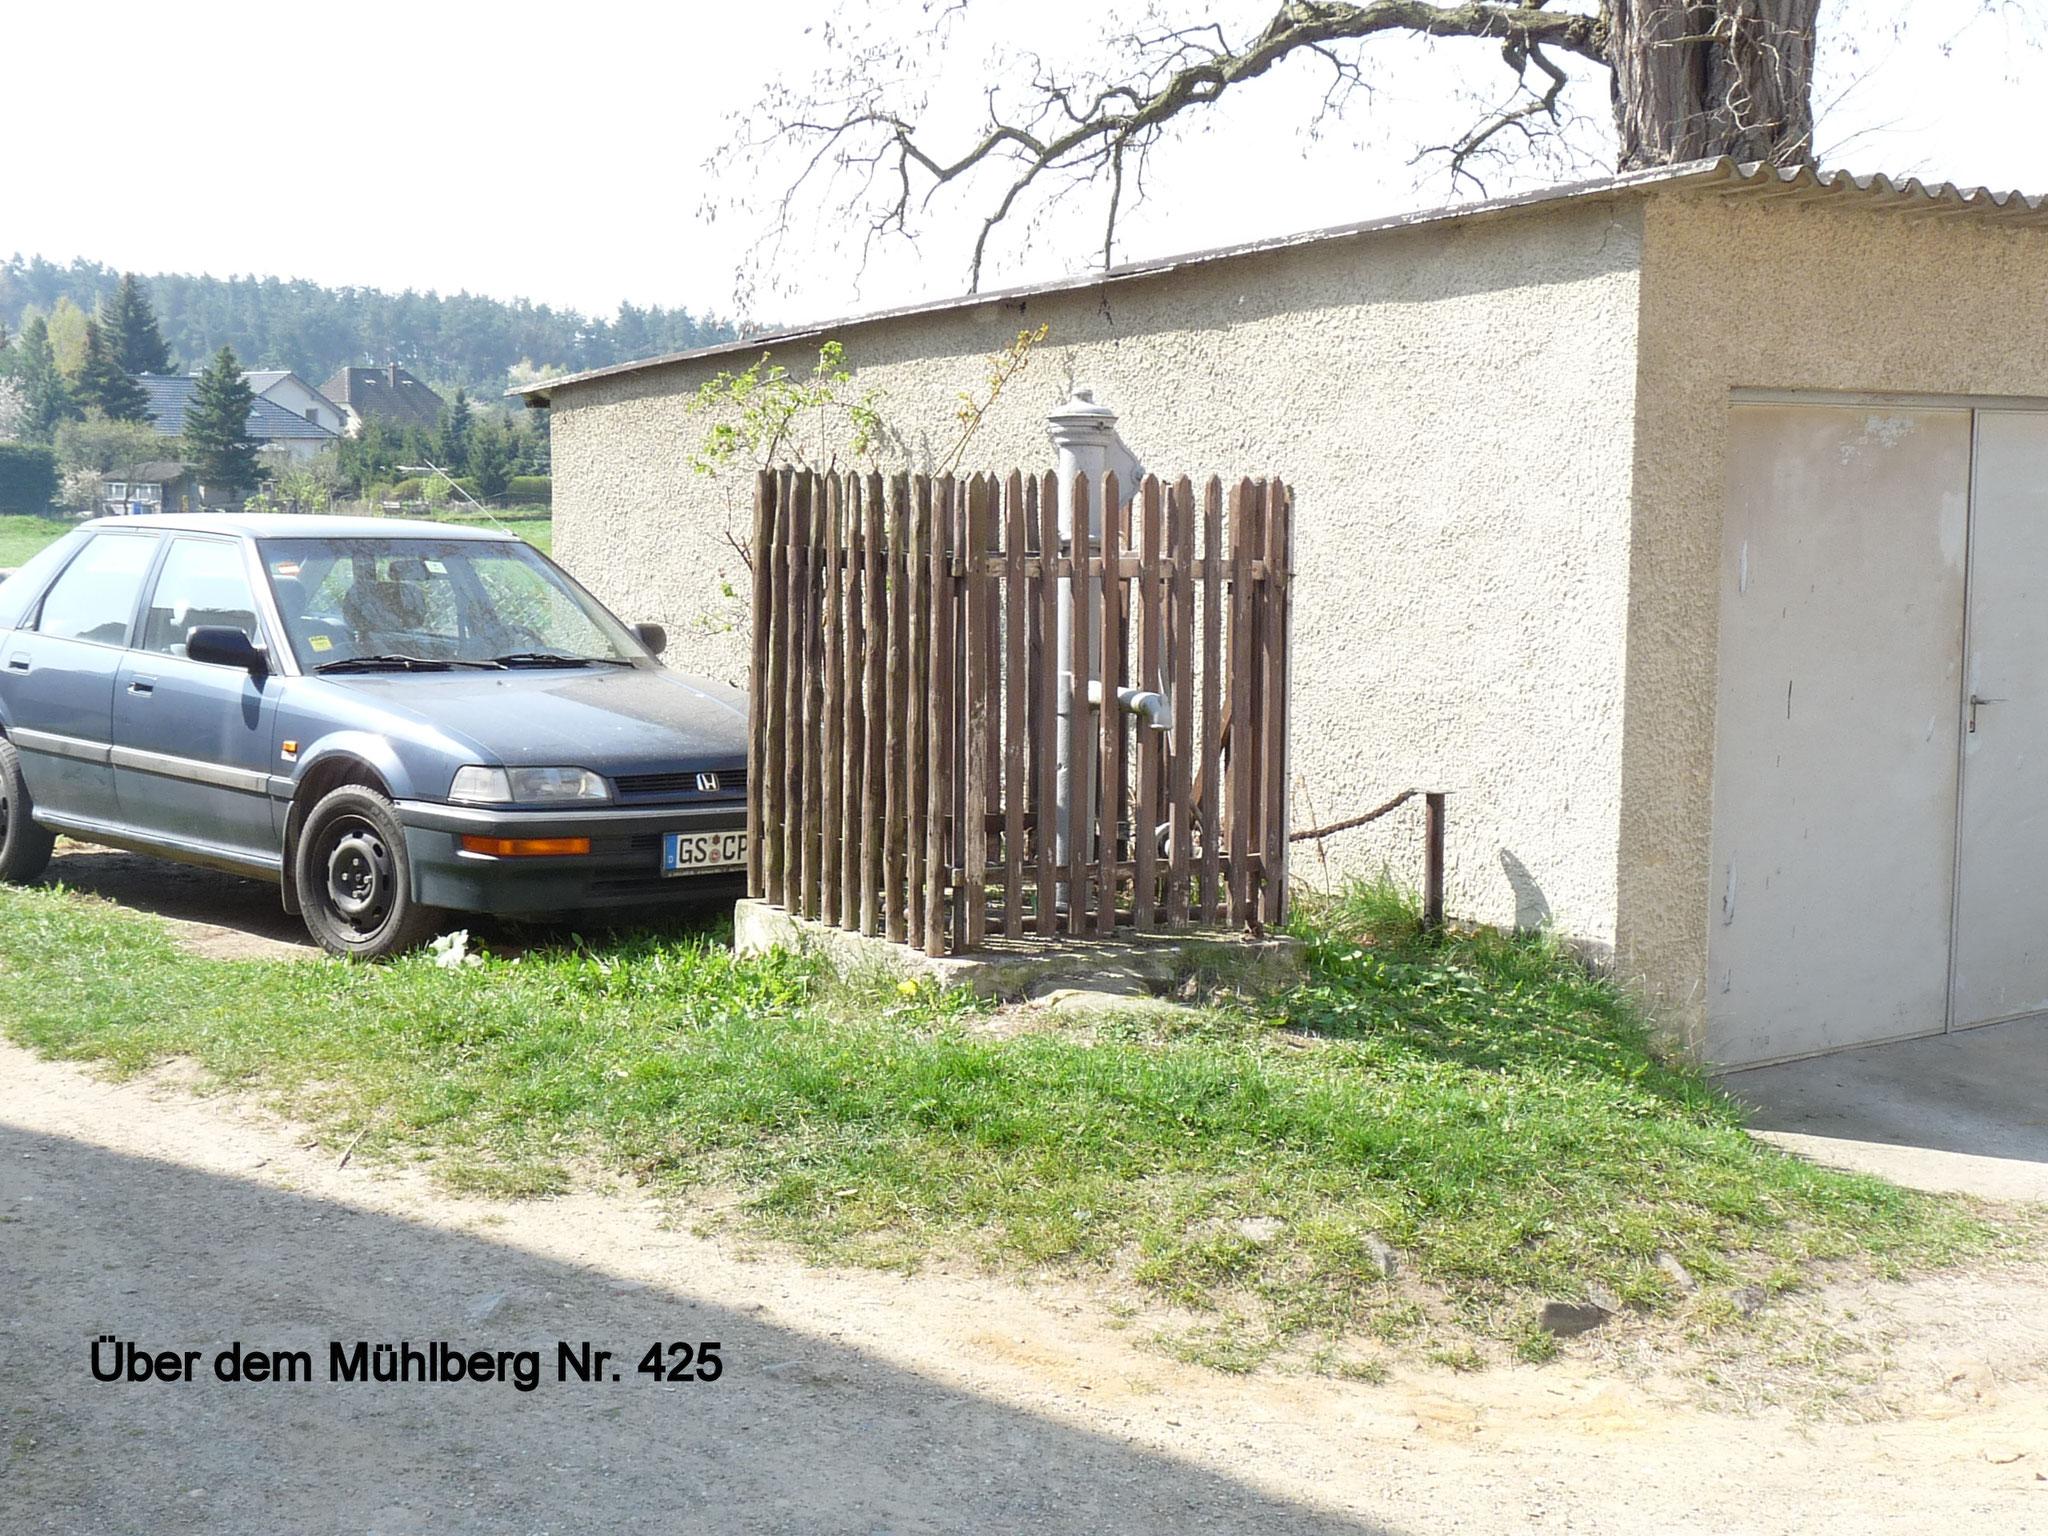 Über dem Mühlberg 415